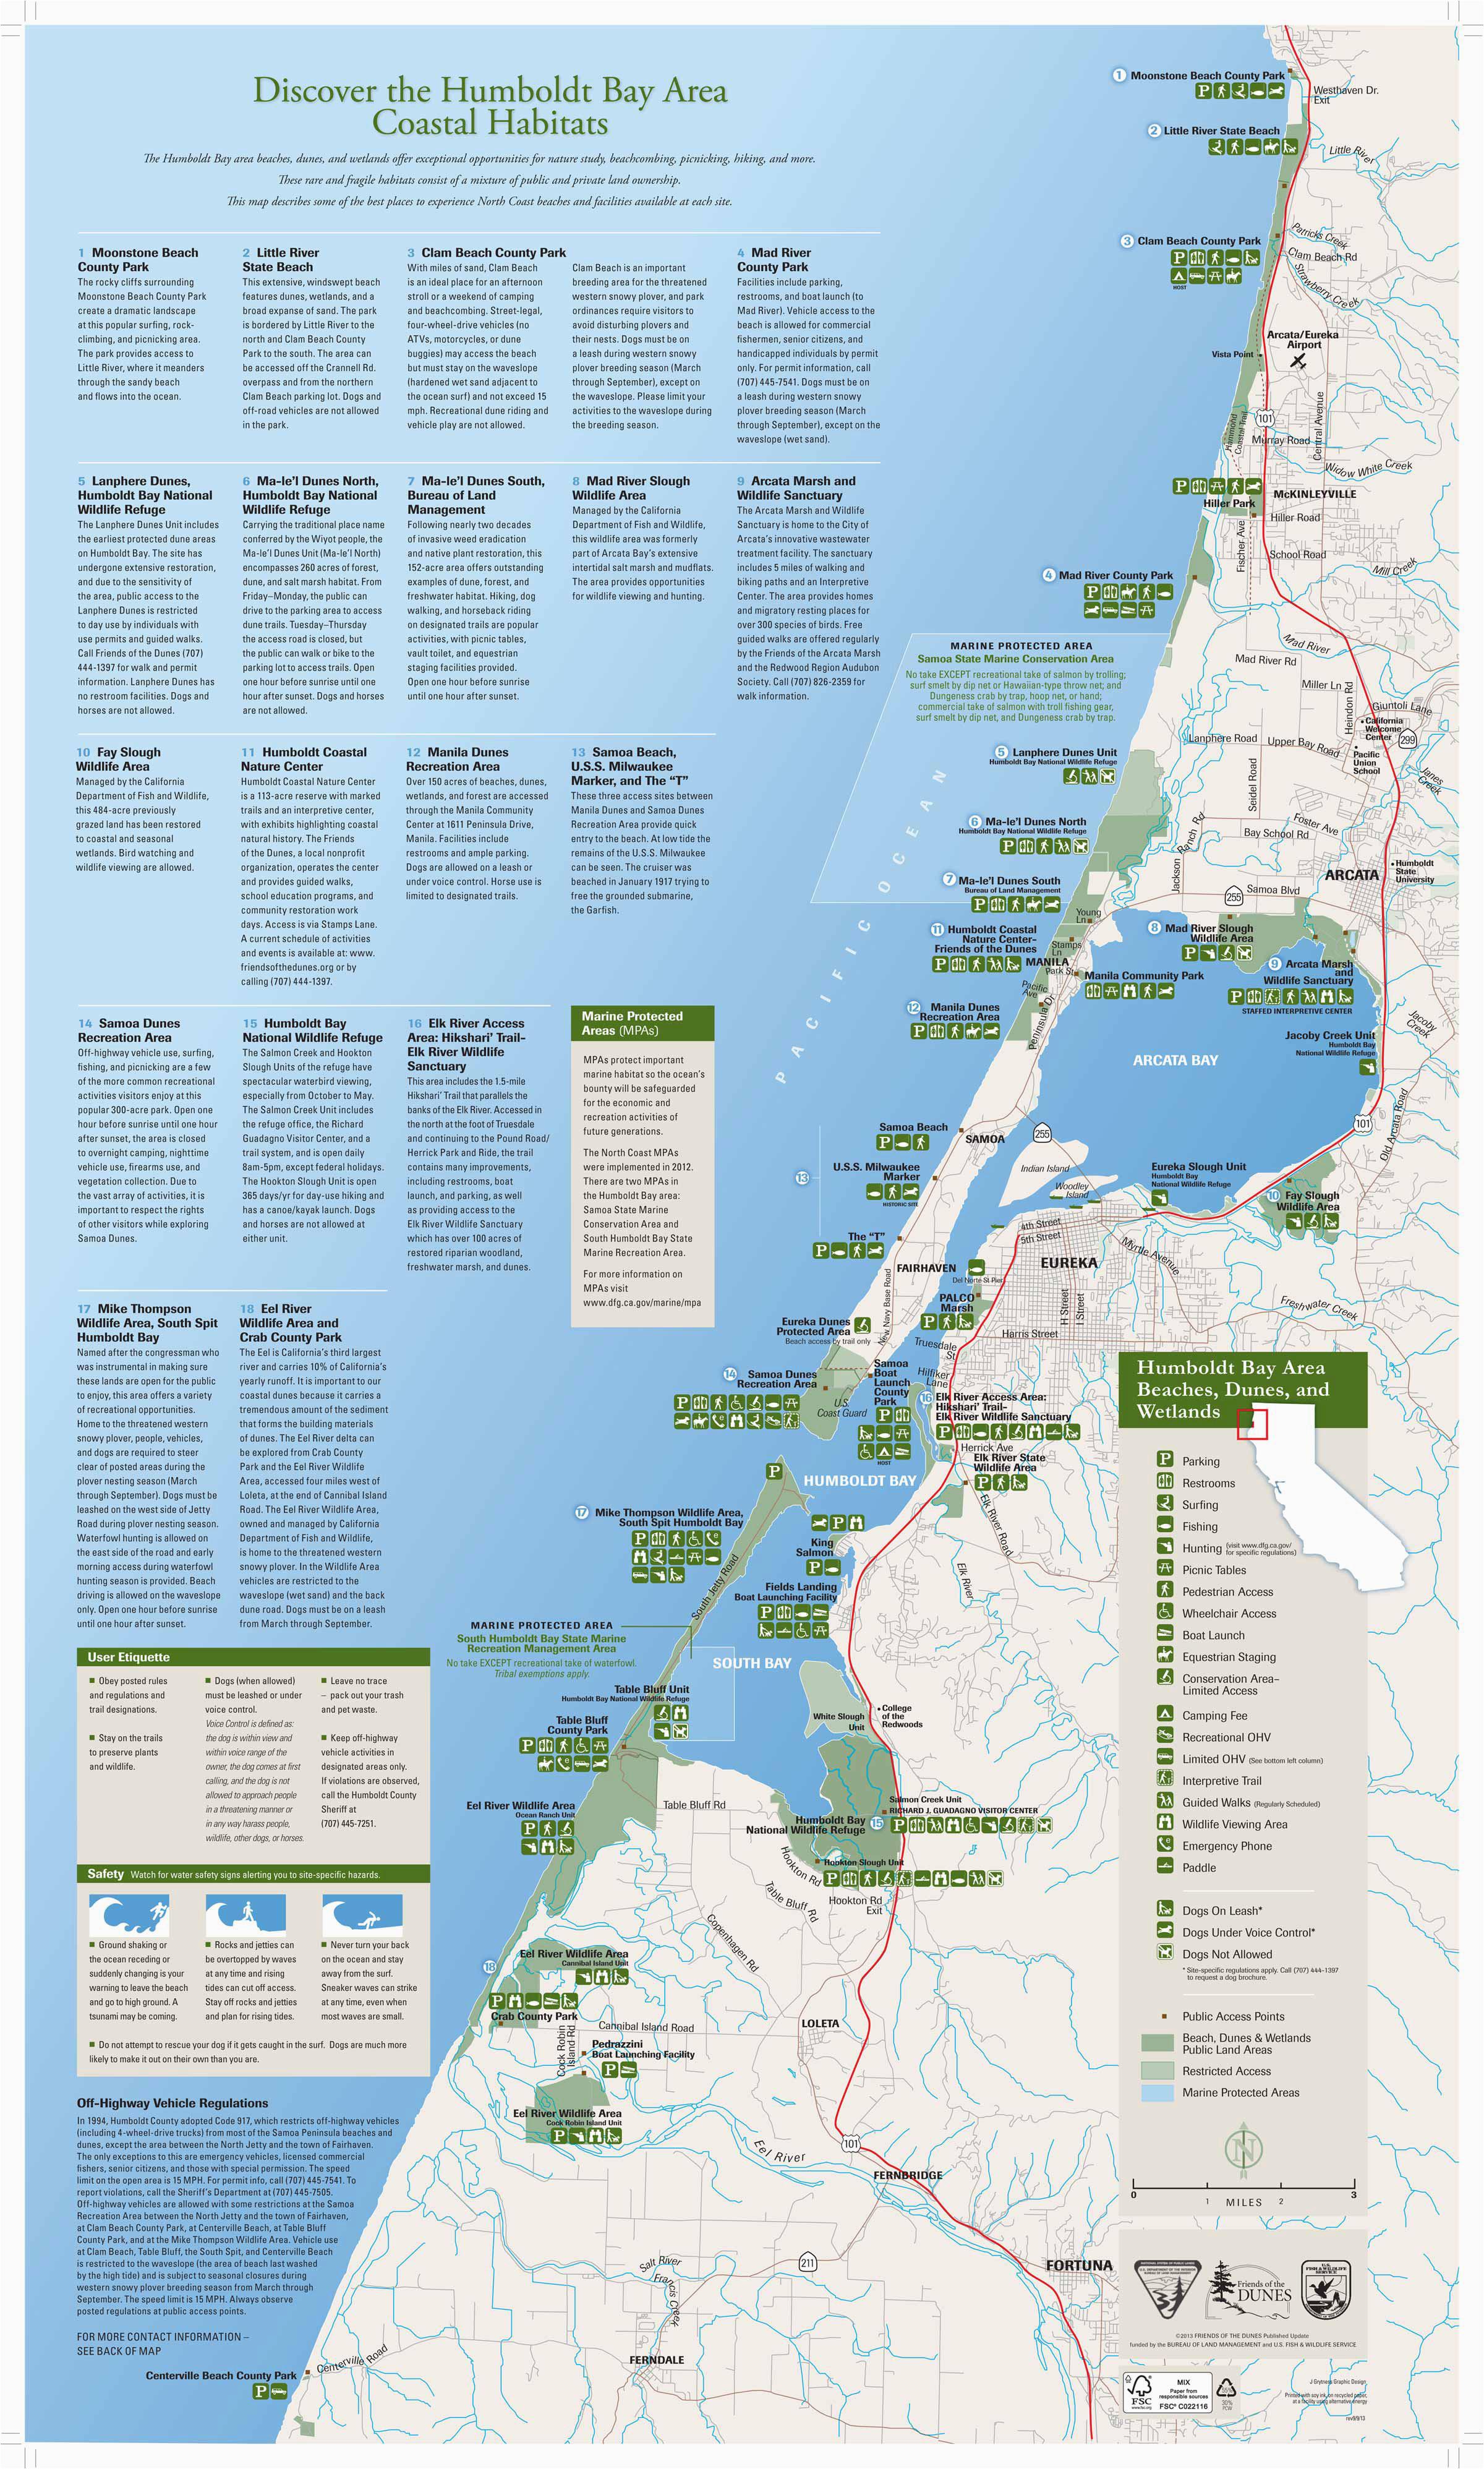 California Coast Ranges Map California Coast Ranges Map Fresh Map oregon and California Coast